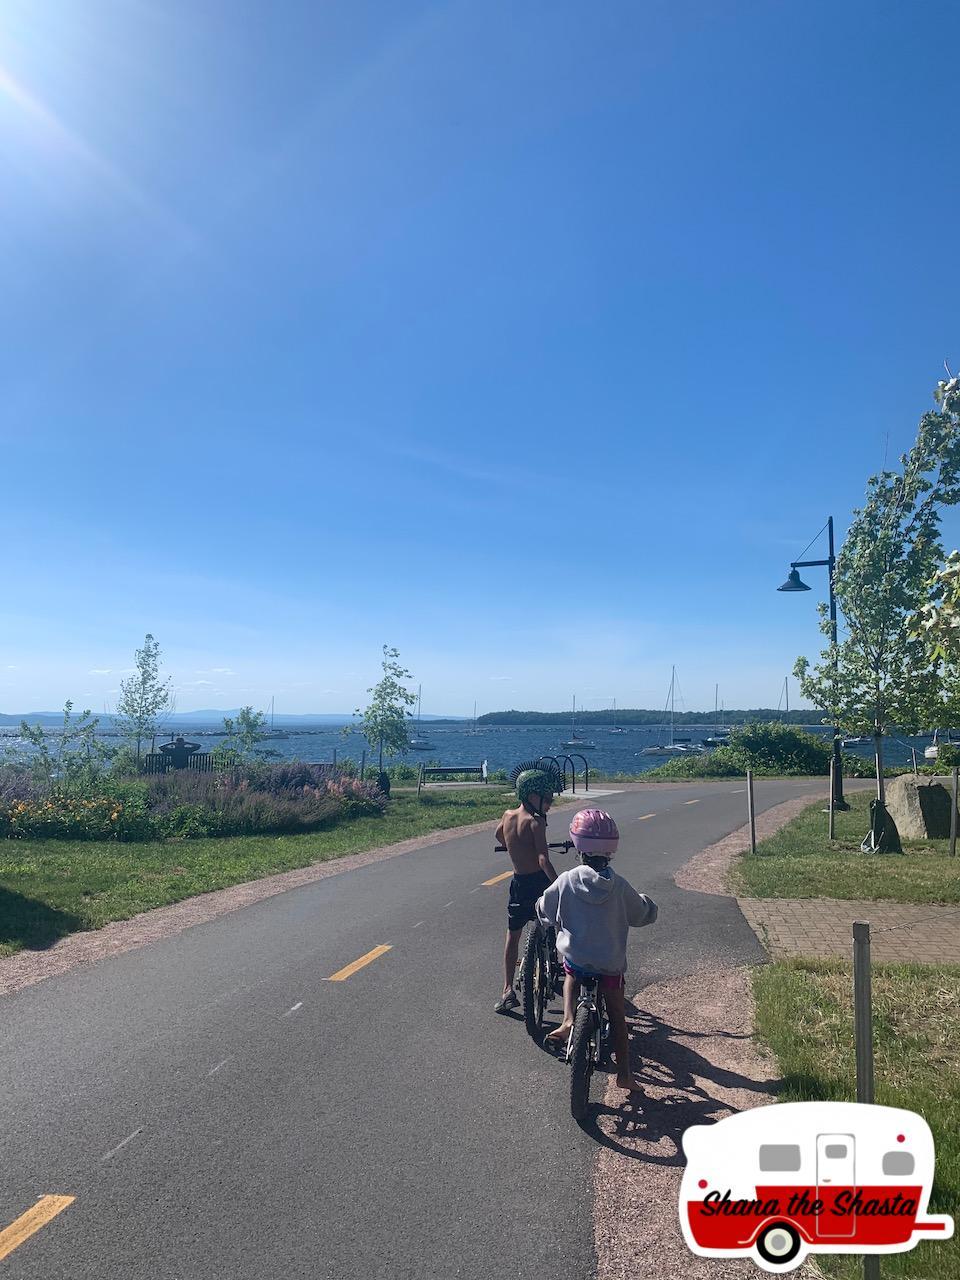 Bikers-on-Burlington-Bike-Path